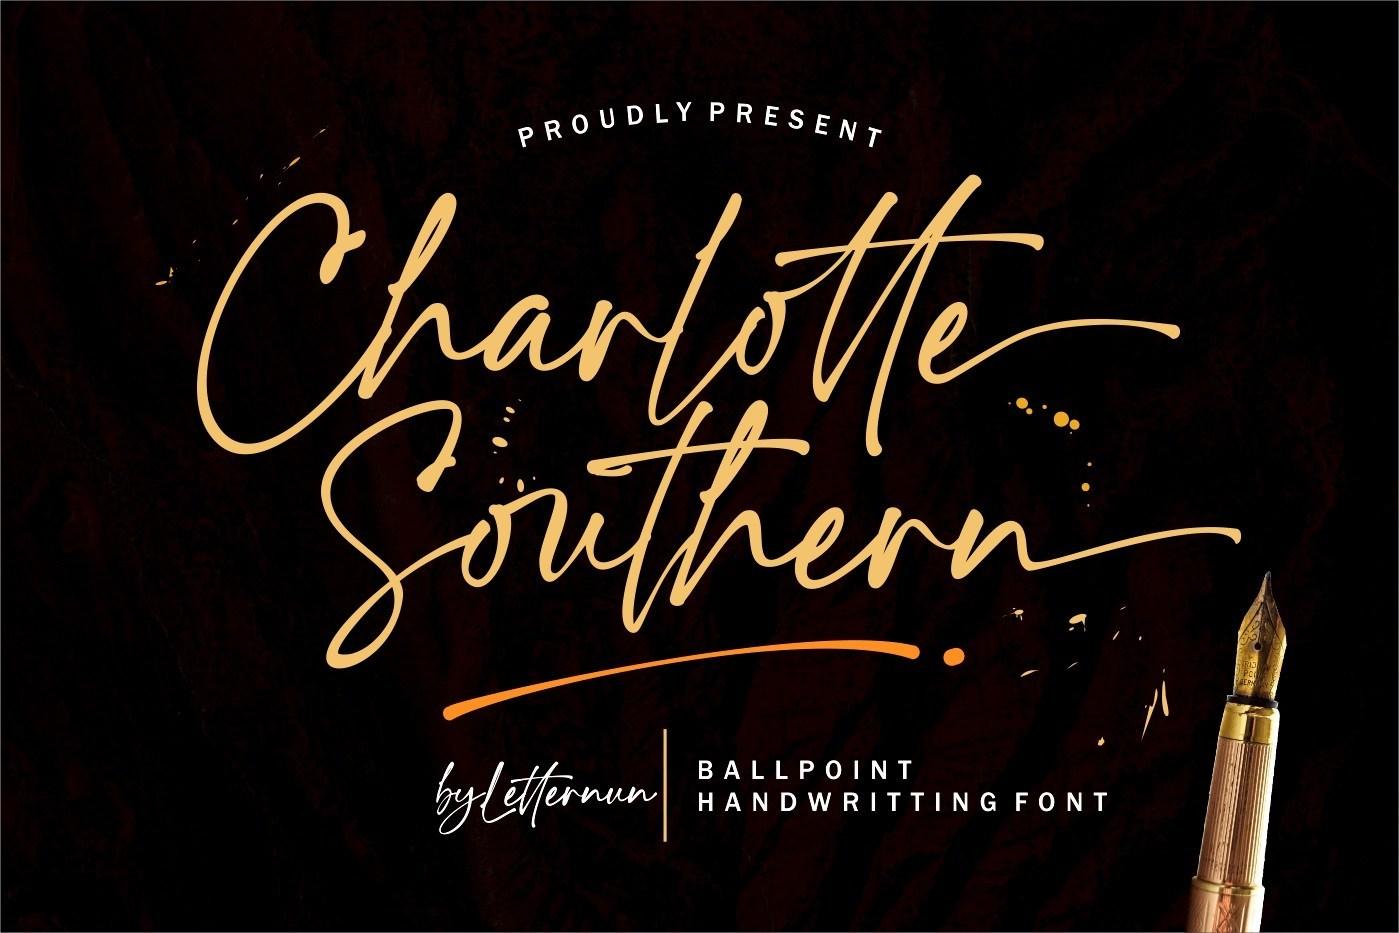 Charlotte-Southern-Font